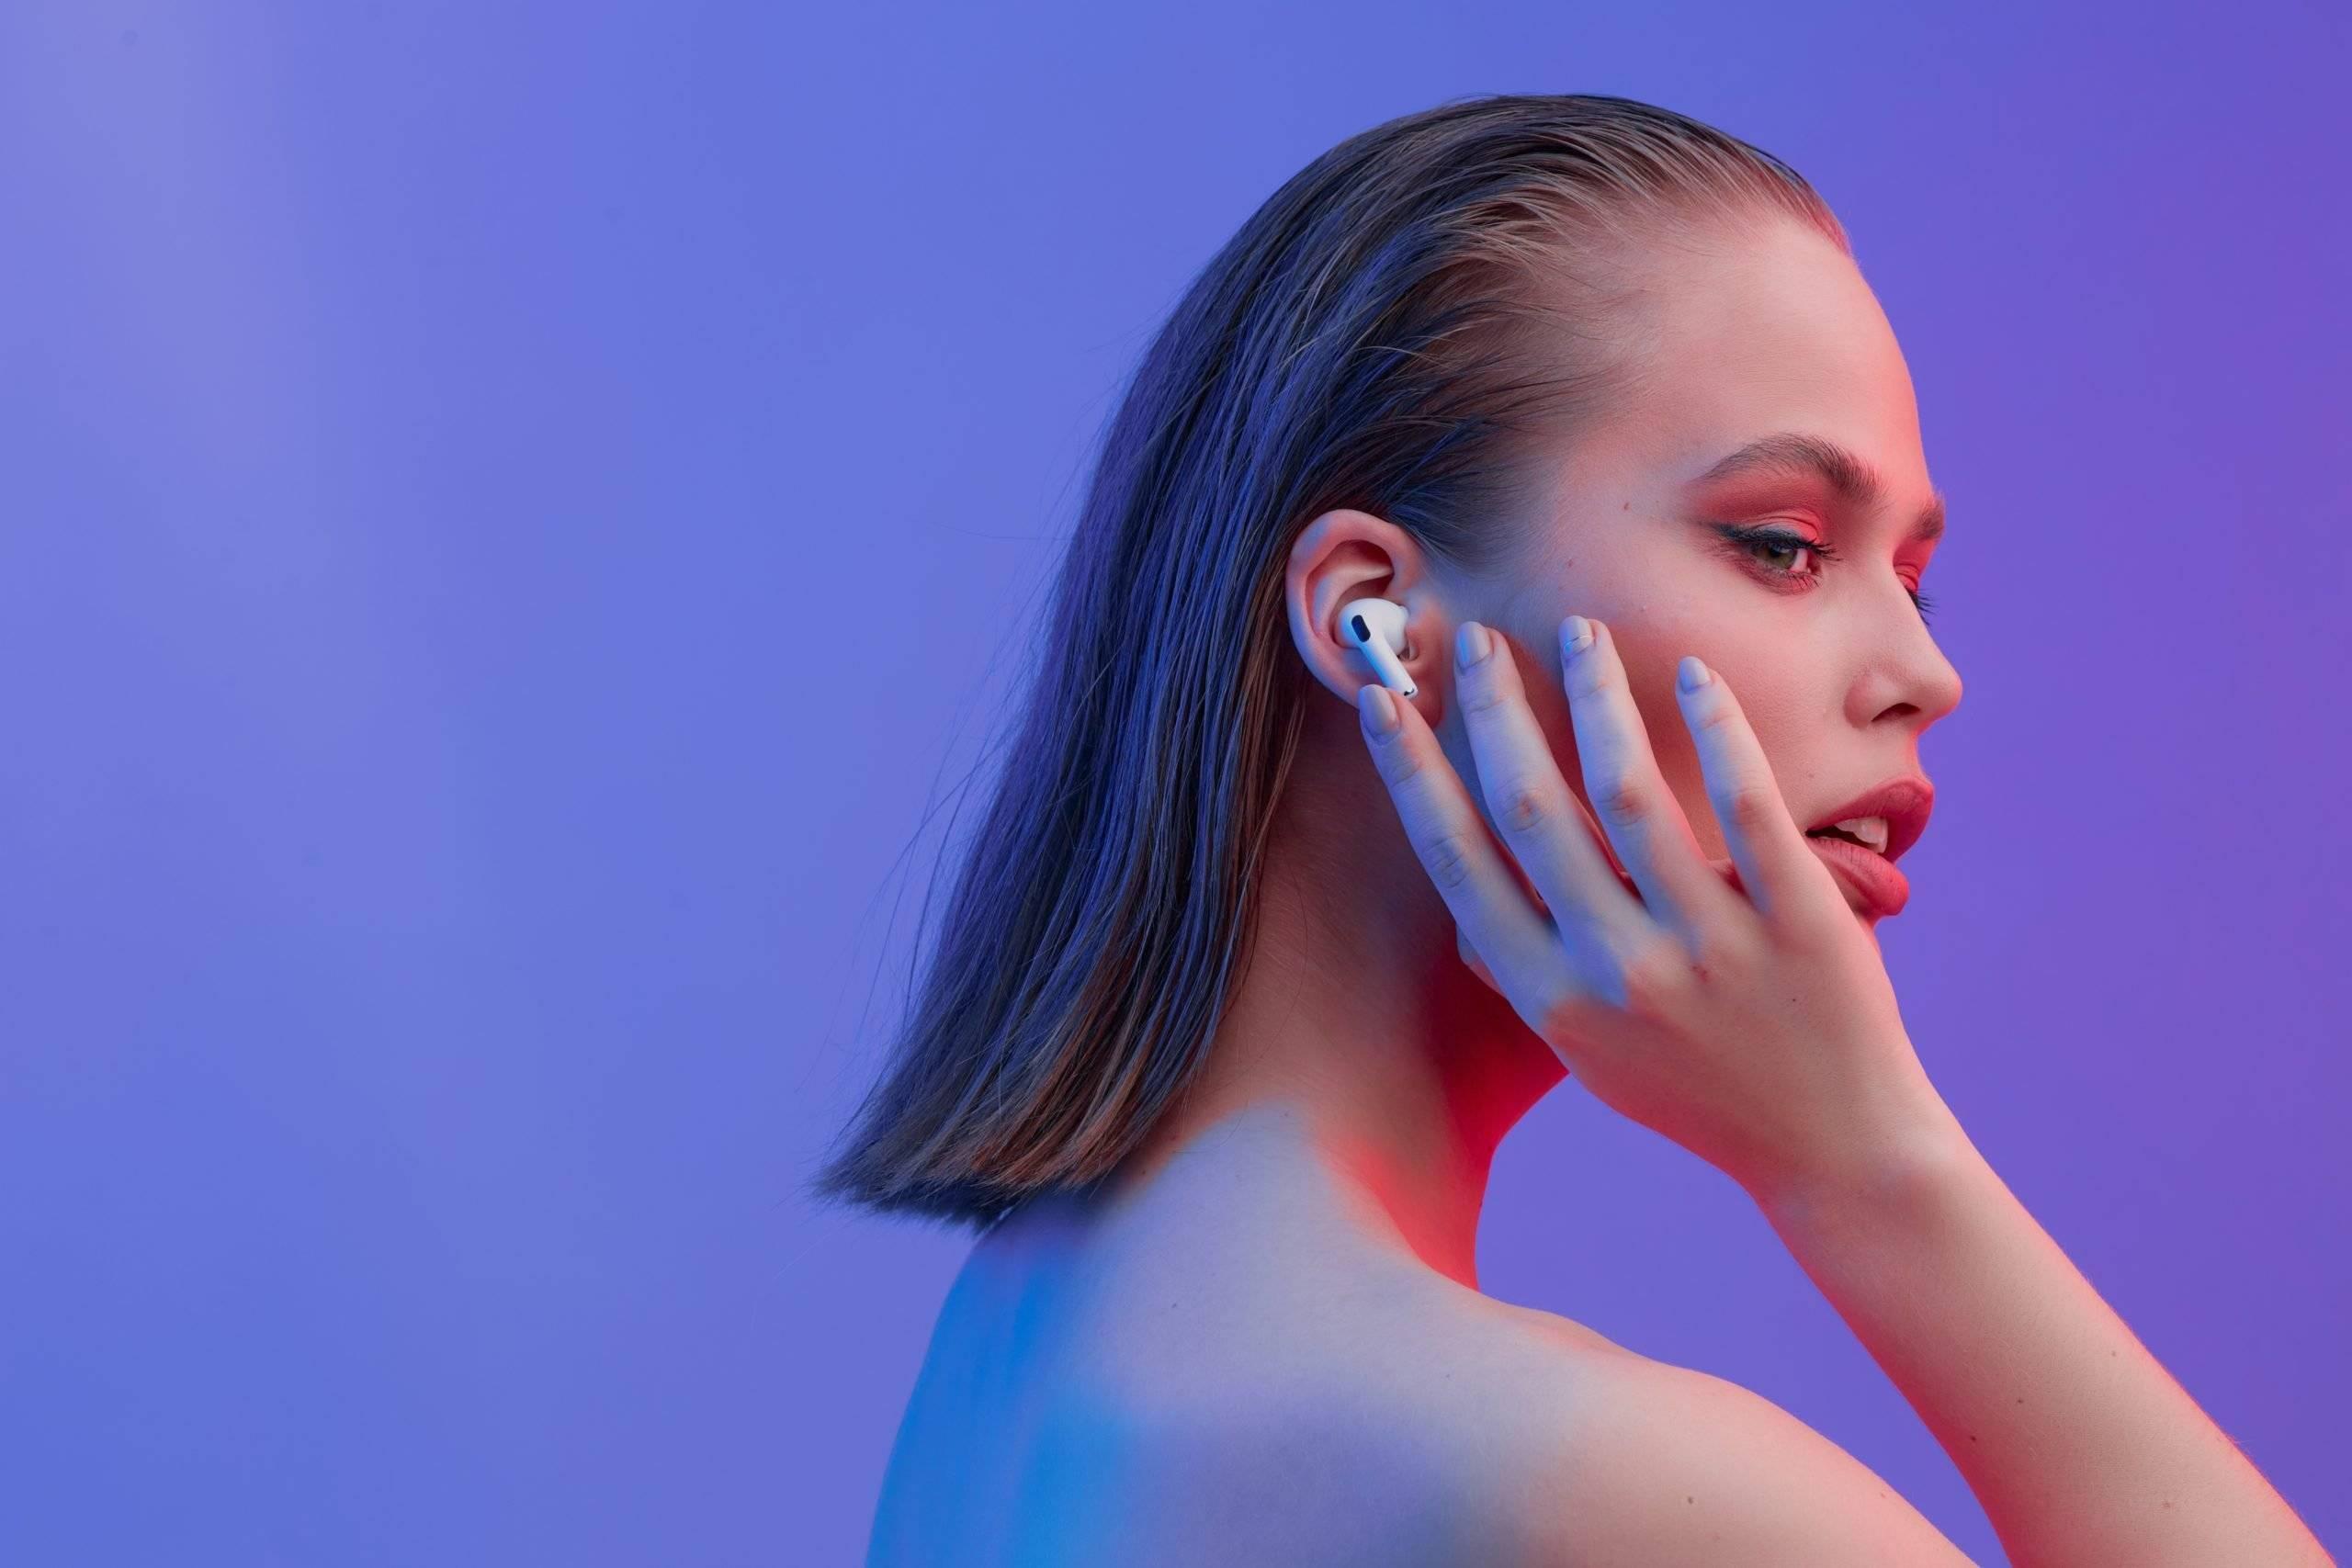 AirPods 之后,未来的耳机可能是「无形」的